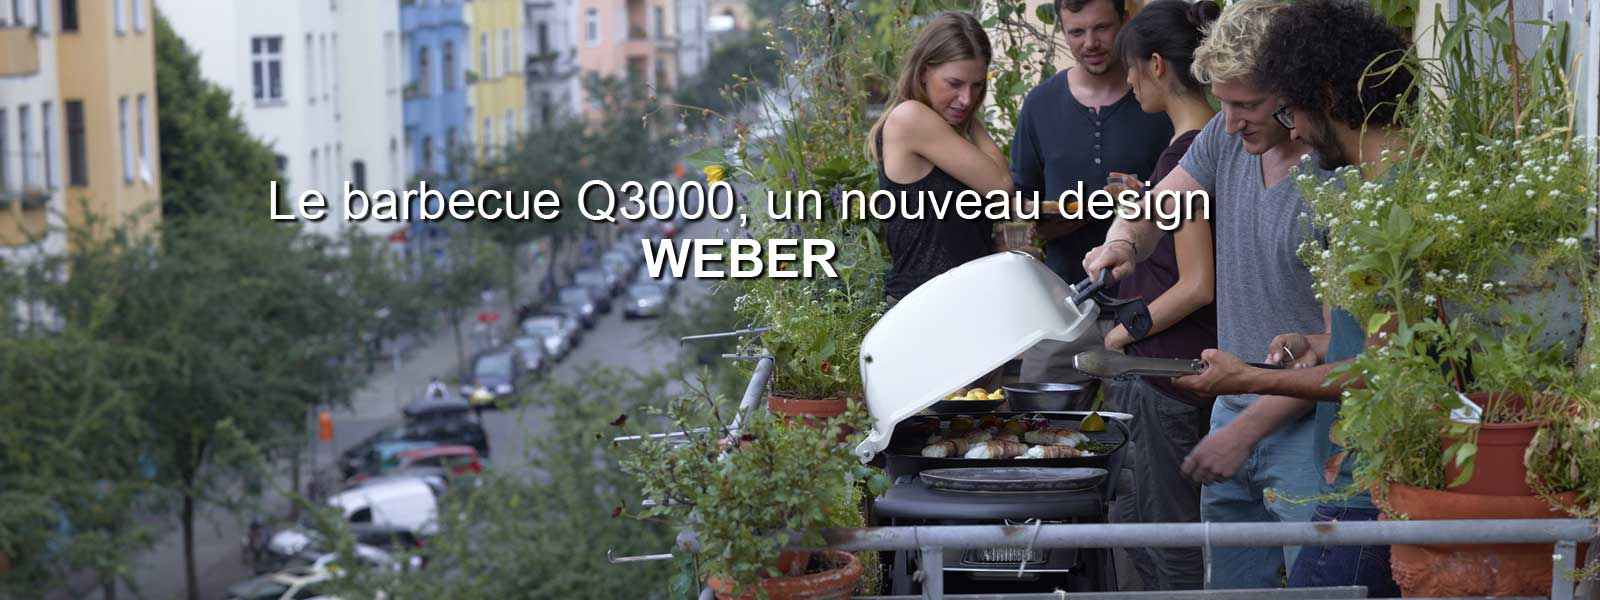 barbecue au gaz weber q3000, titanium | leroy merlin